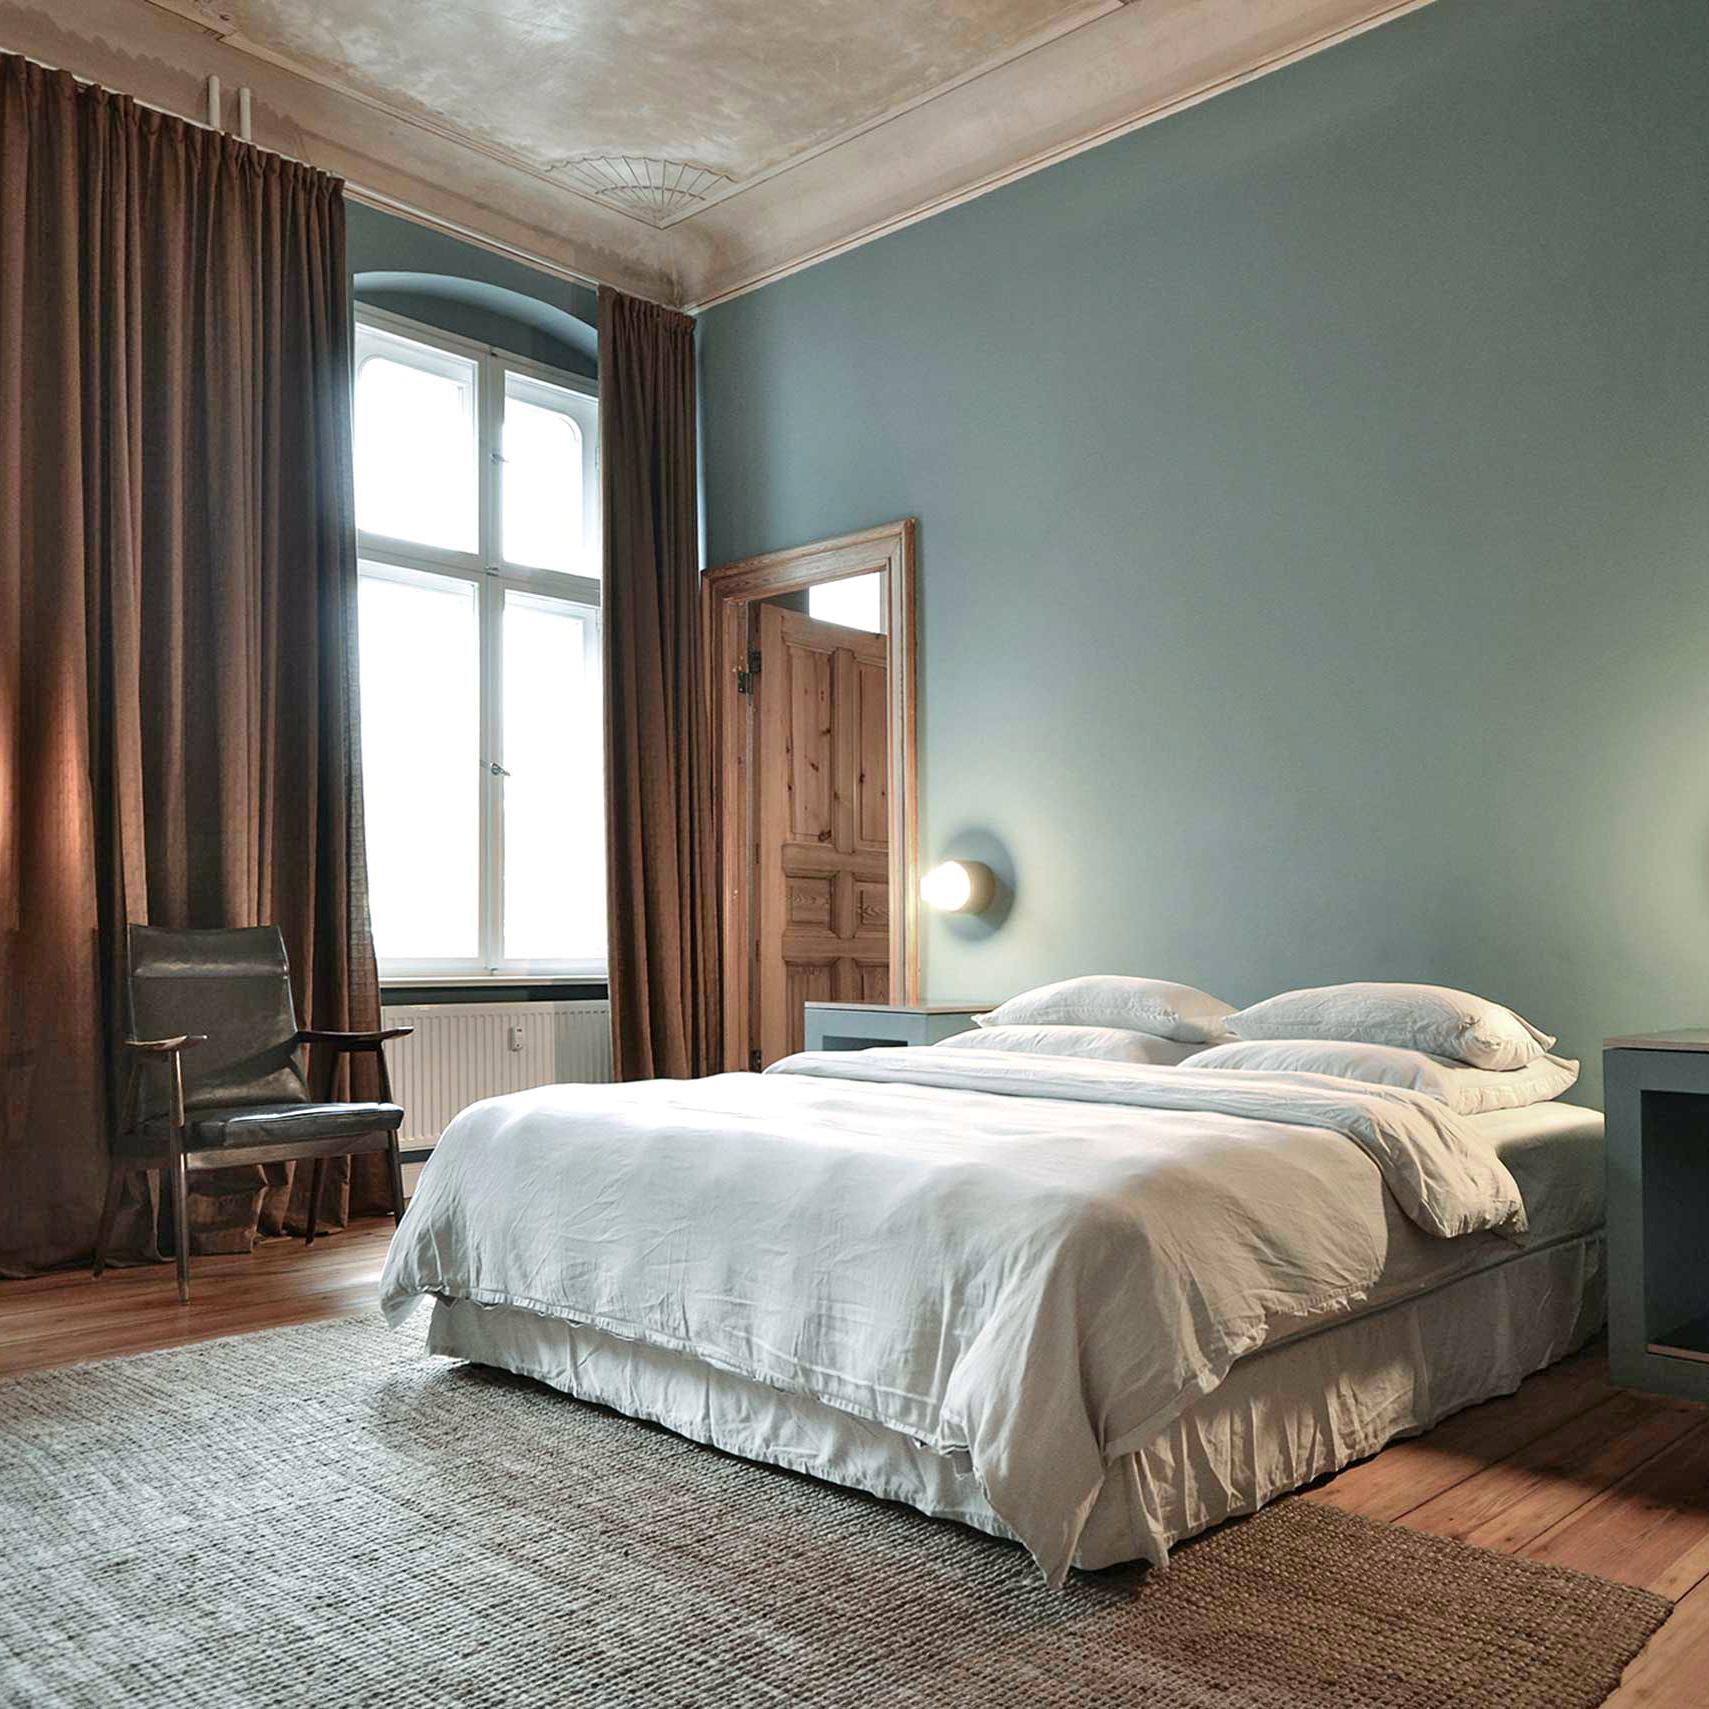 Suite-030-Berlin-Ferienappartments-Eberswalder-98-1